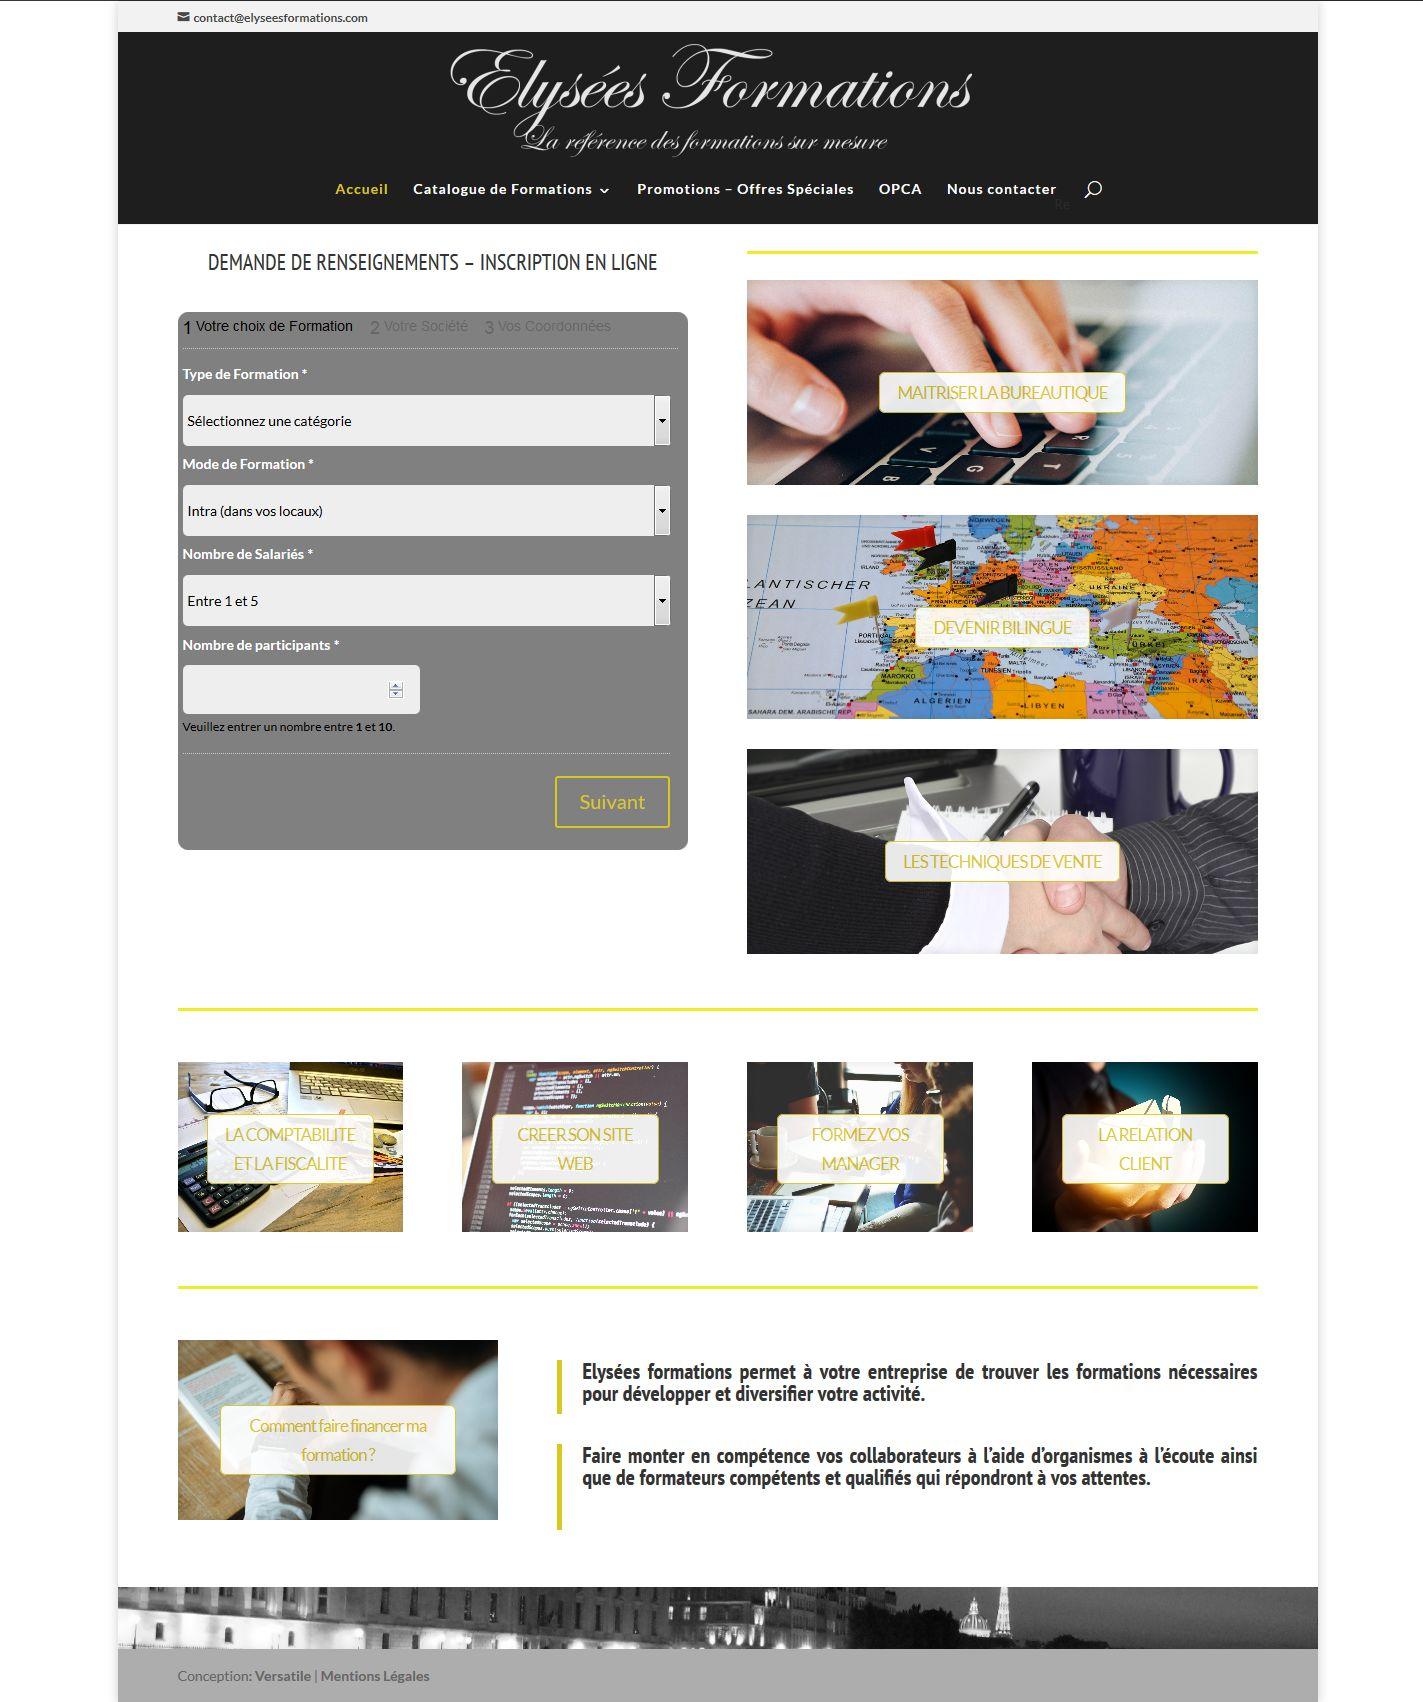 Formation professionnelle - Financement I Elysées Formations' - elyseesformations_com